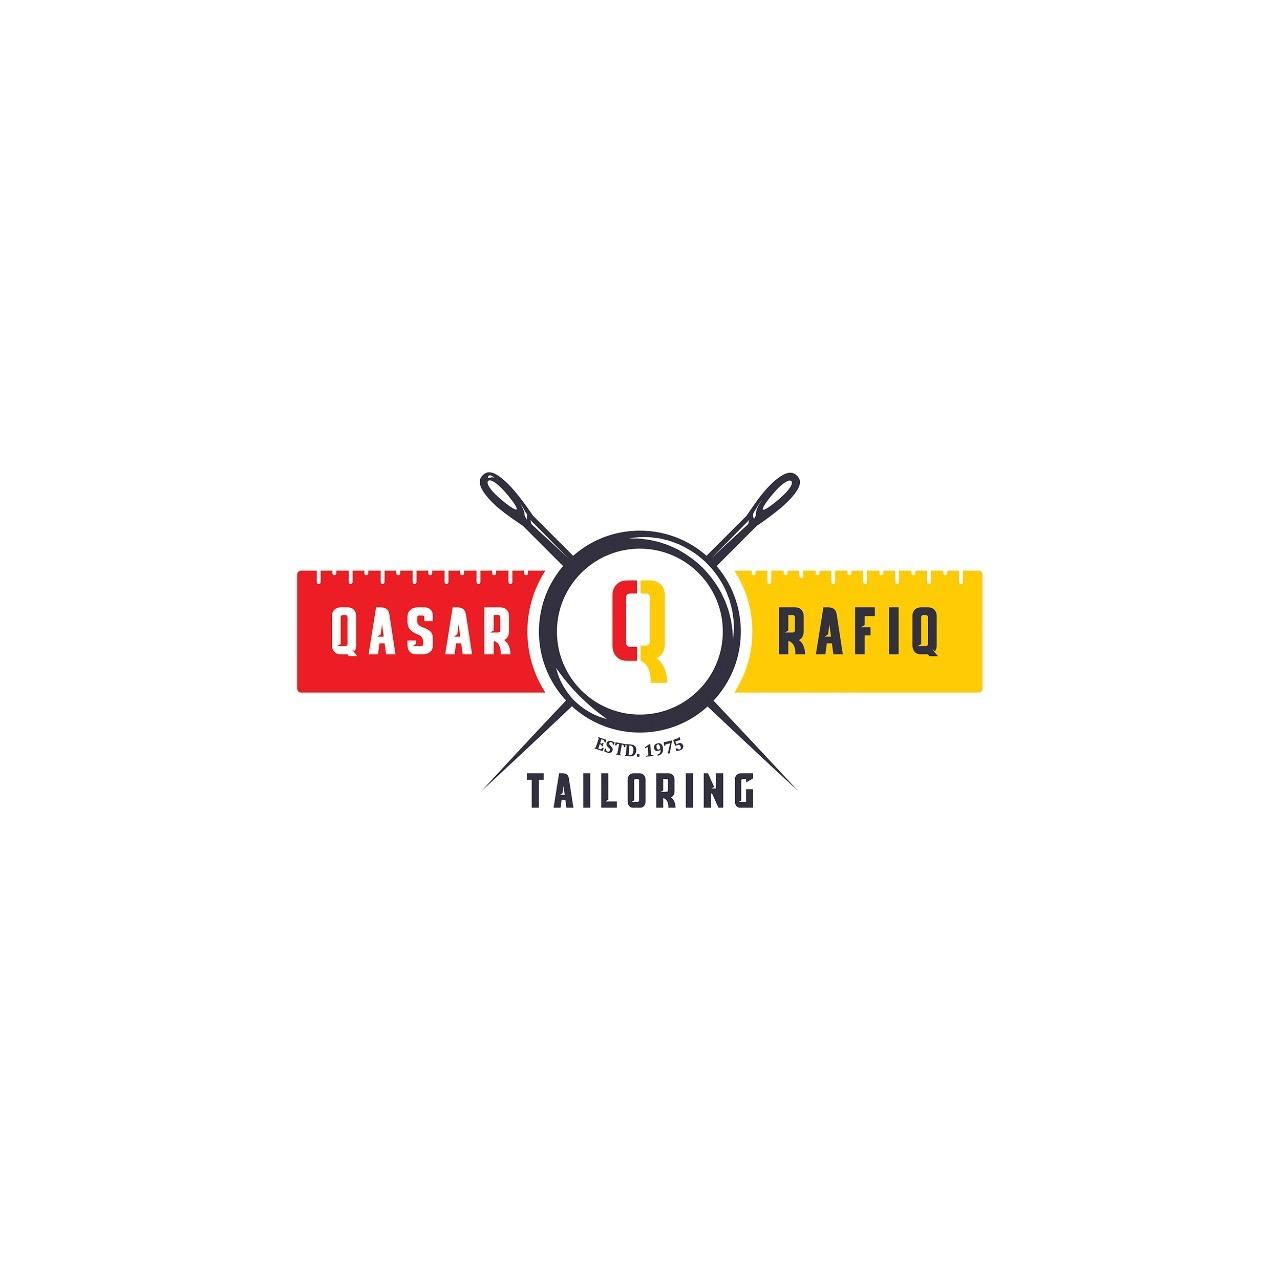 Qaser Rafiq Textile Trading Tailoring & Embroidery